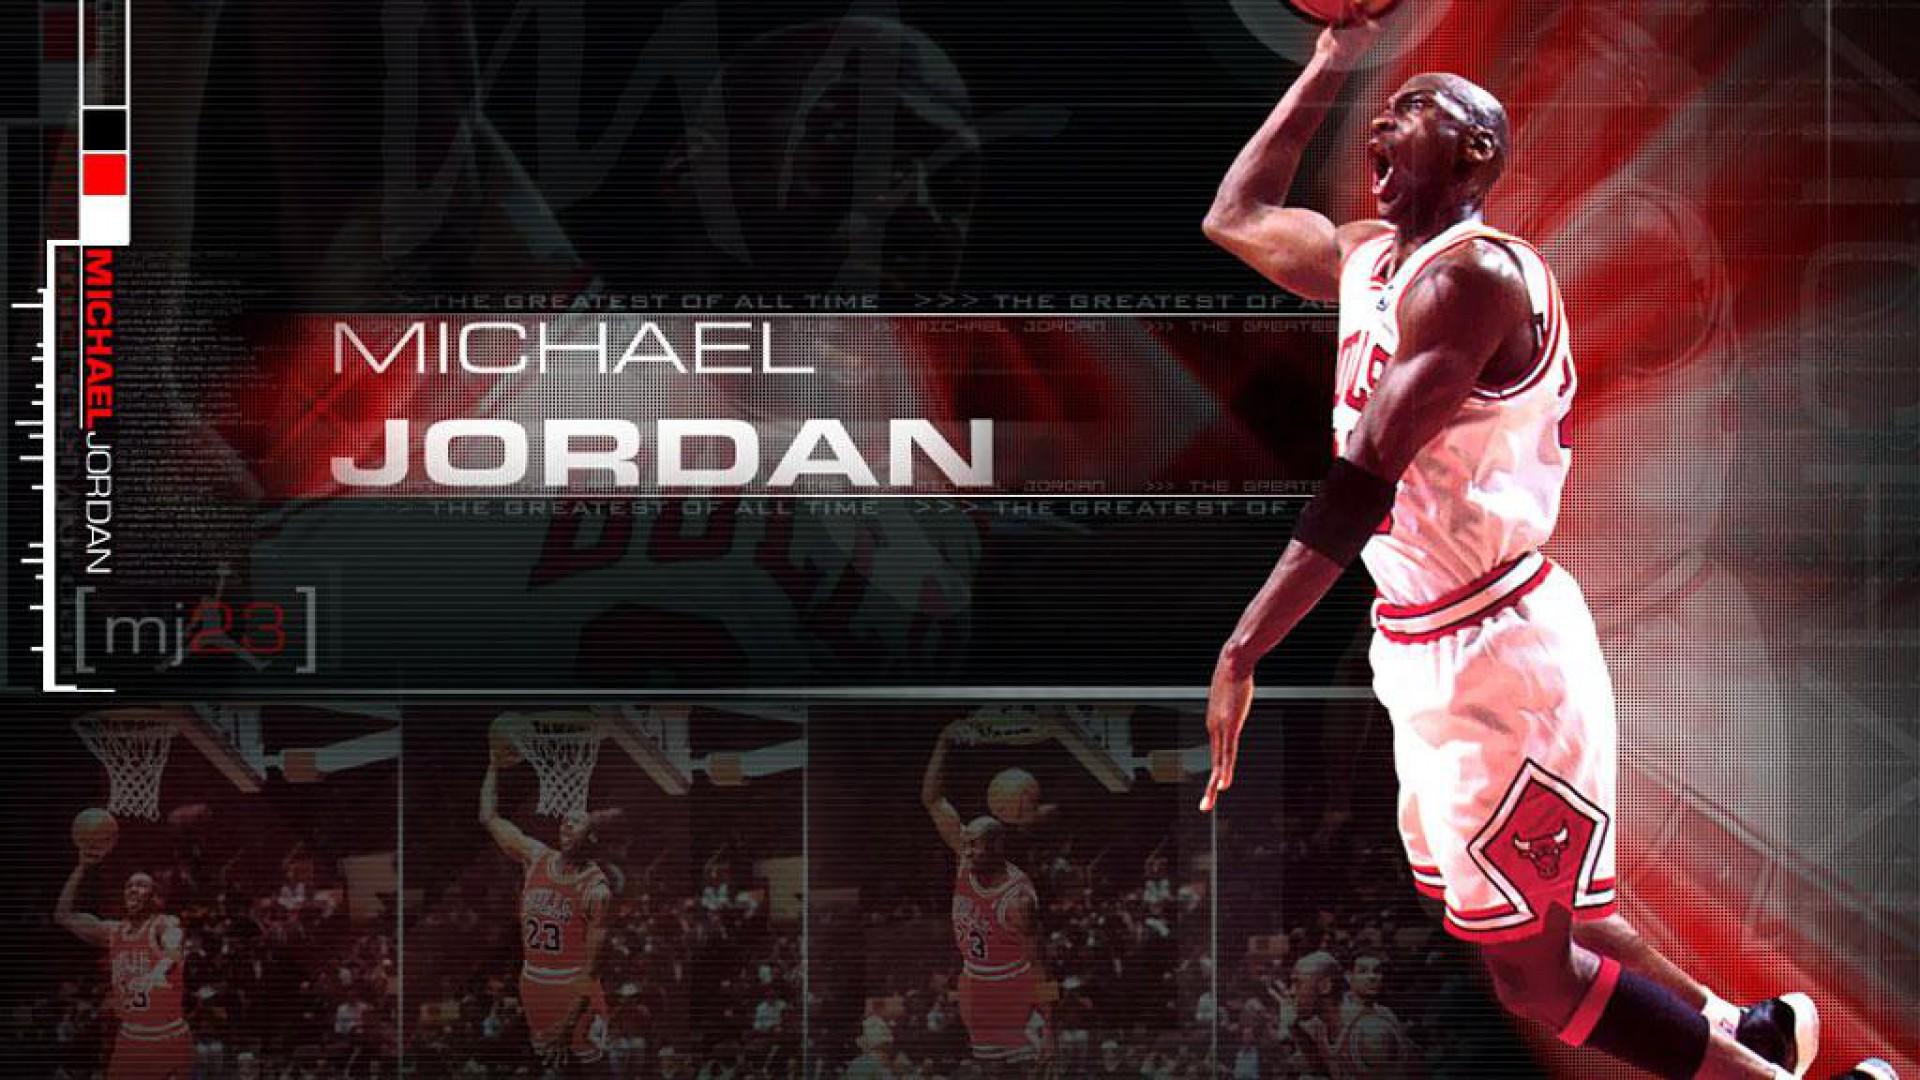 Jordan Wallpapers HD free download | PixelsTalk Net